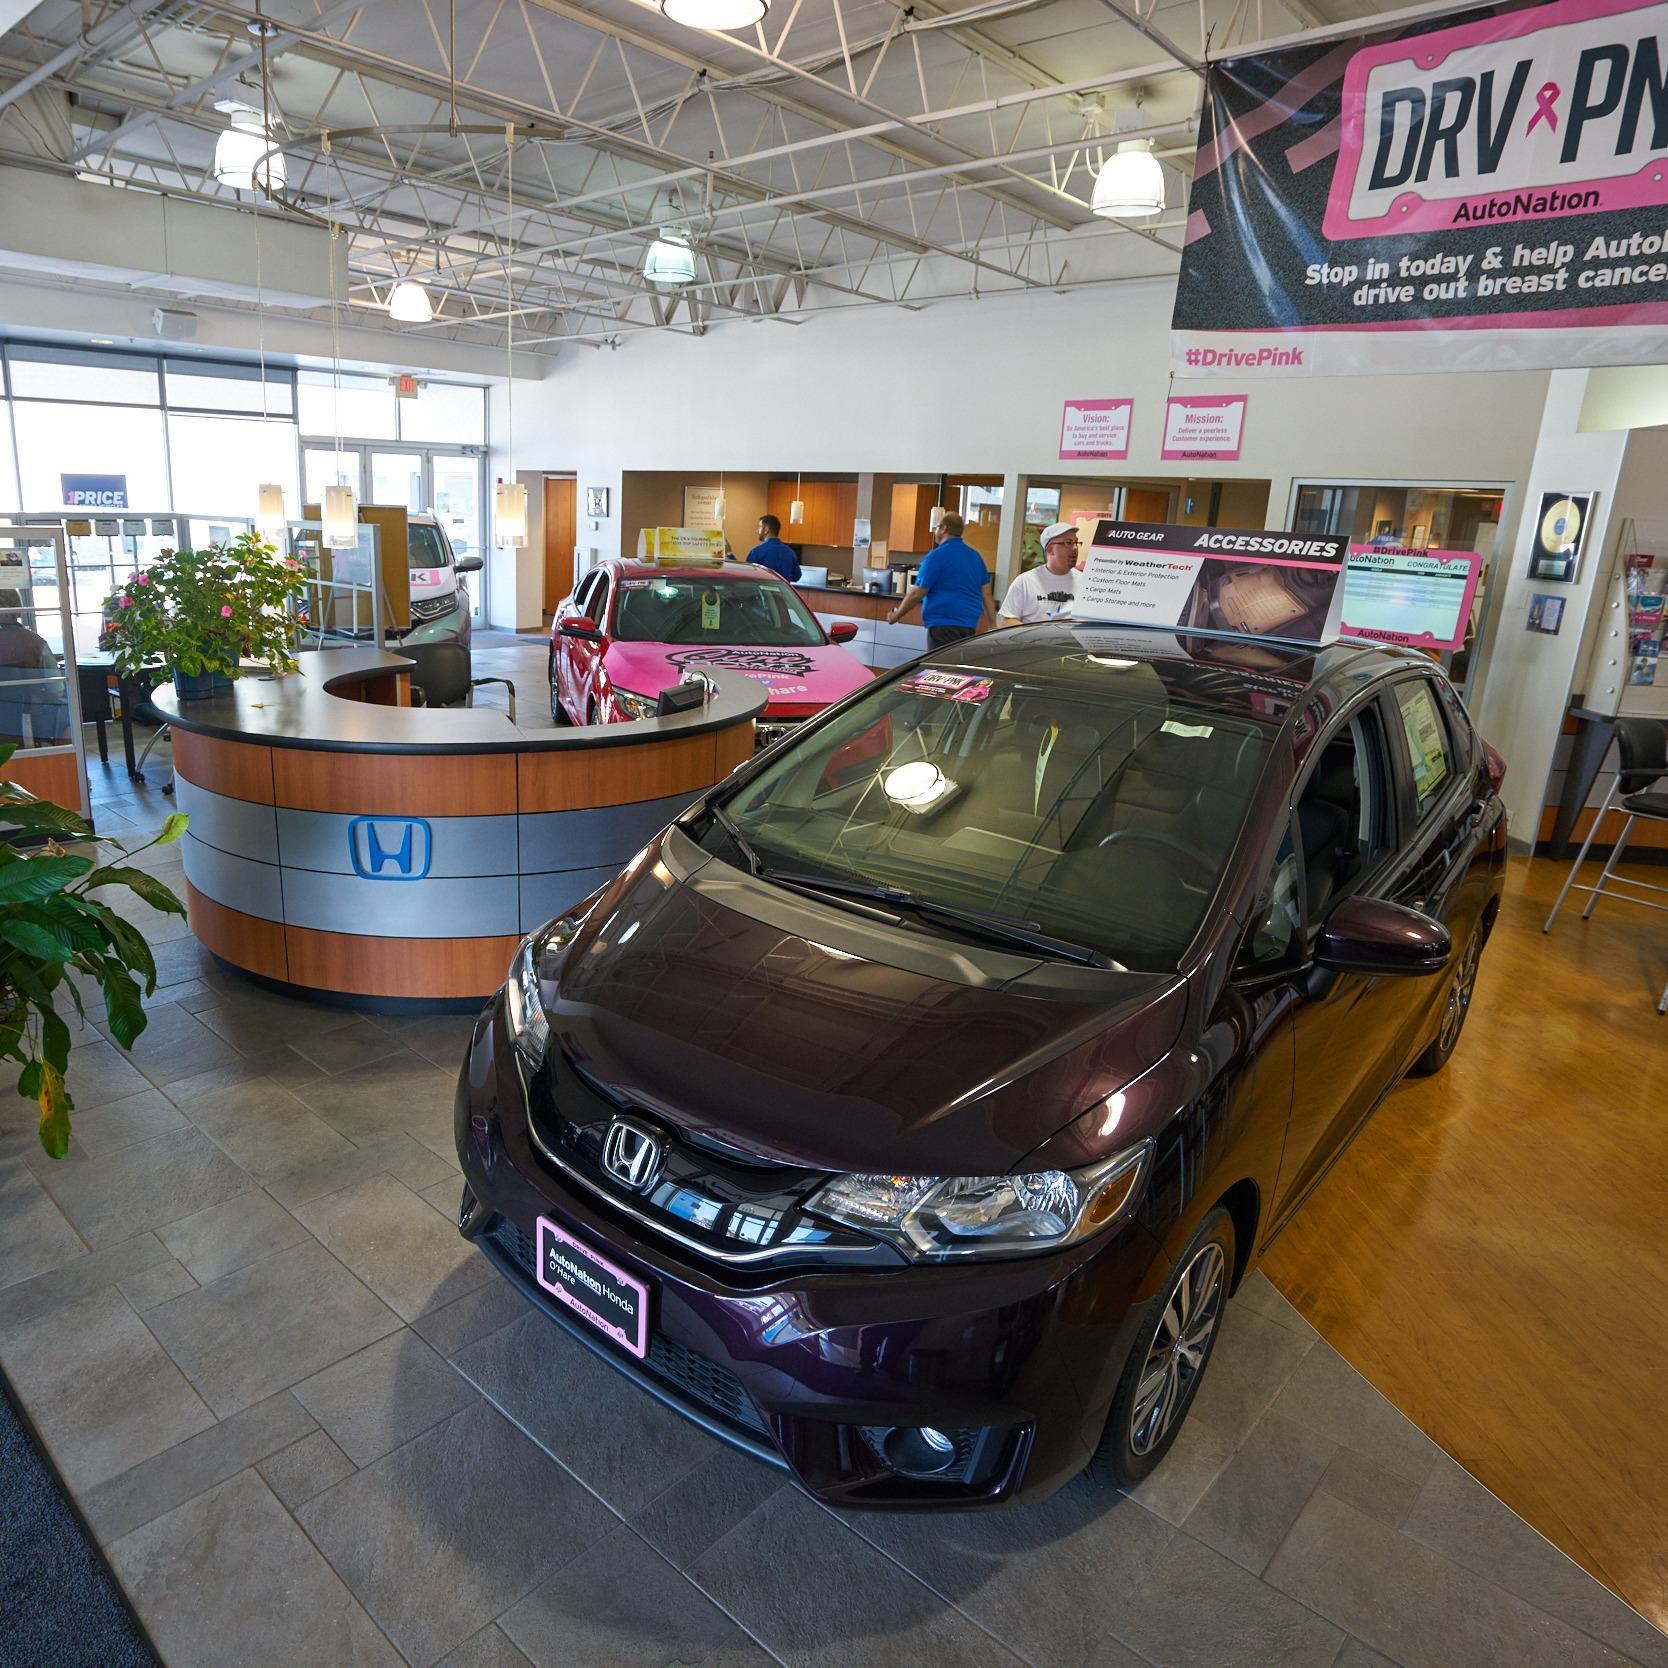 Autonation Honda Thornton Road Home: AutoNation Honda O'Hare 1533 S River Rd Des Plaines, IL